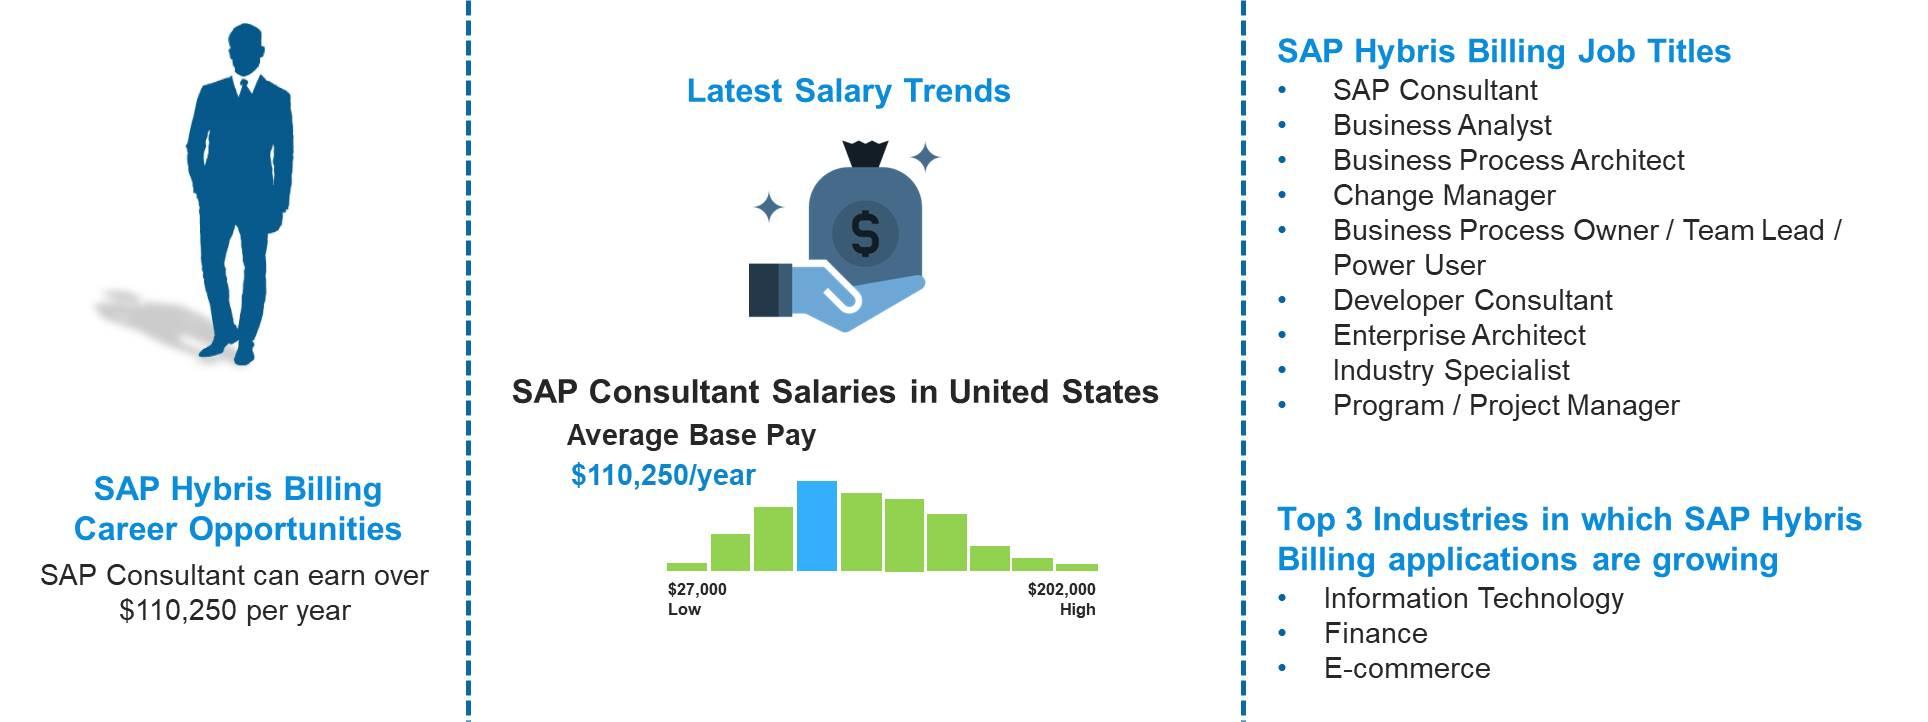 SAP Hybris Billing